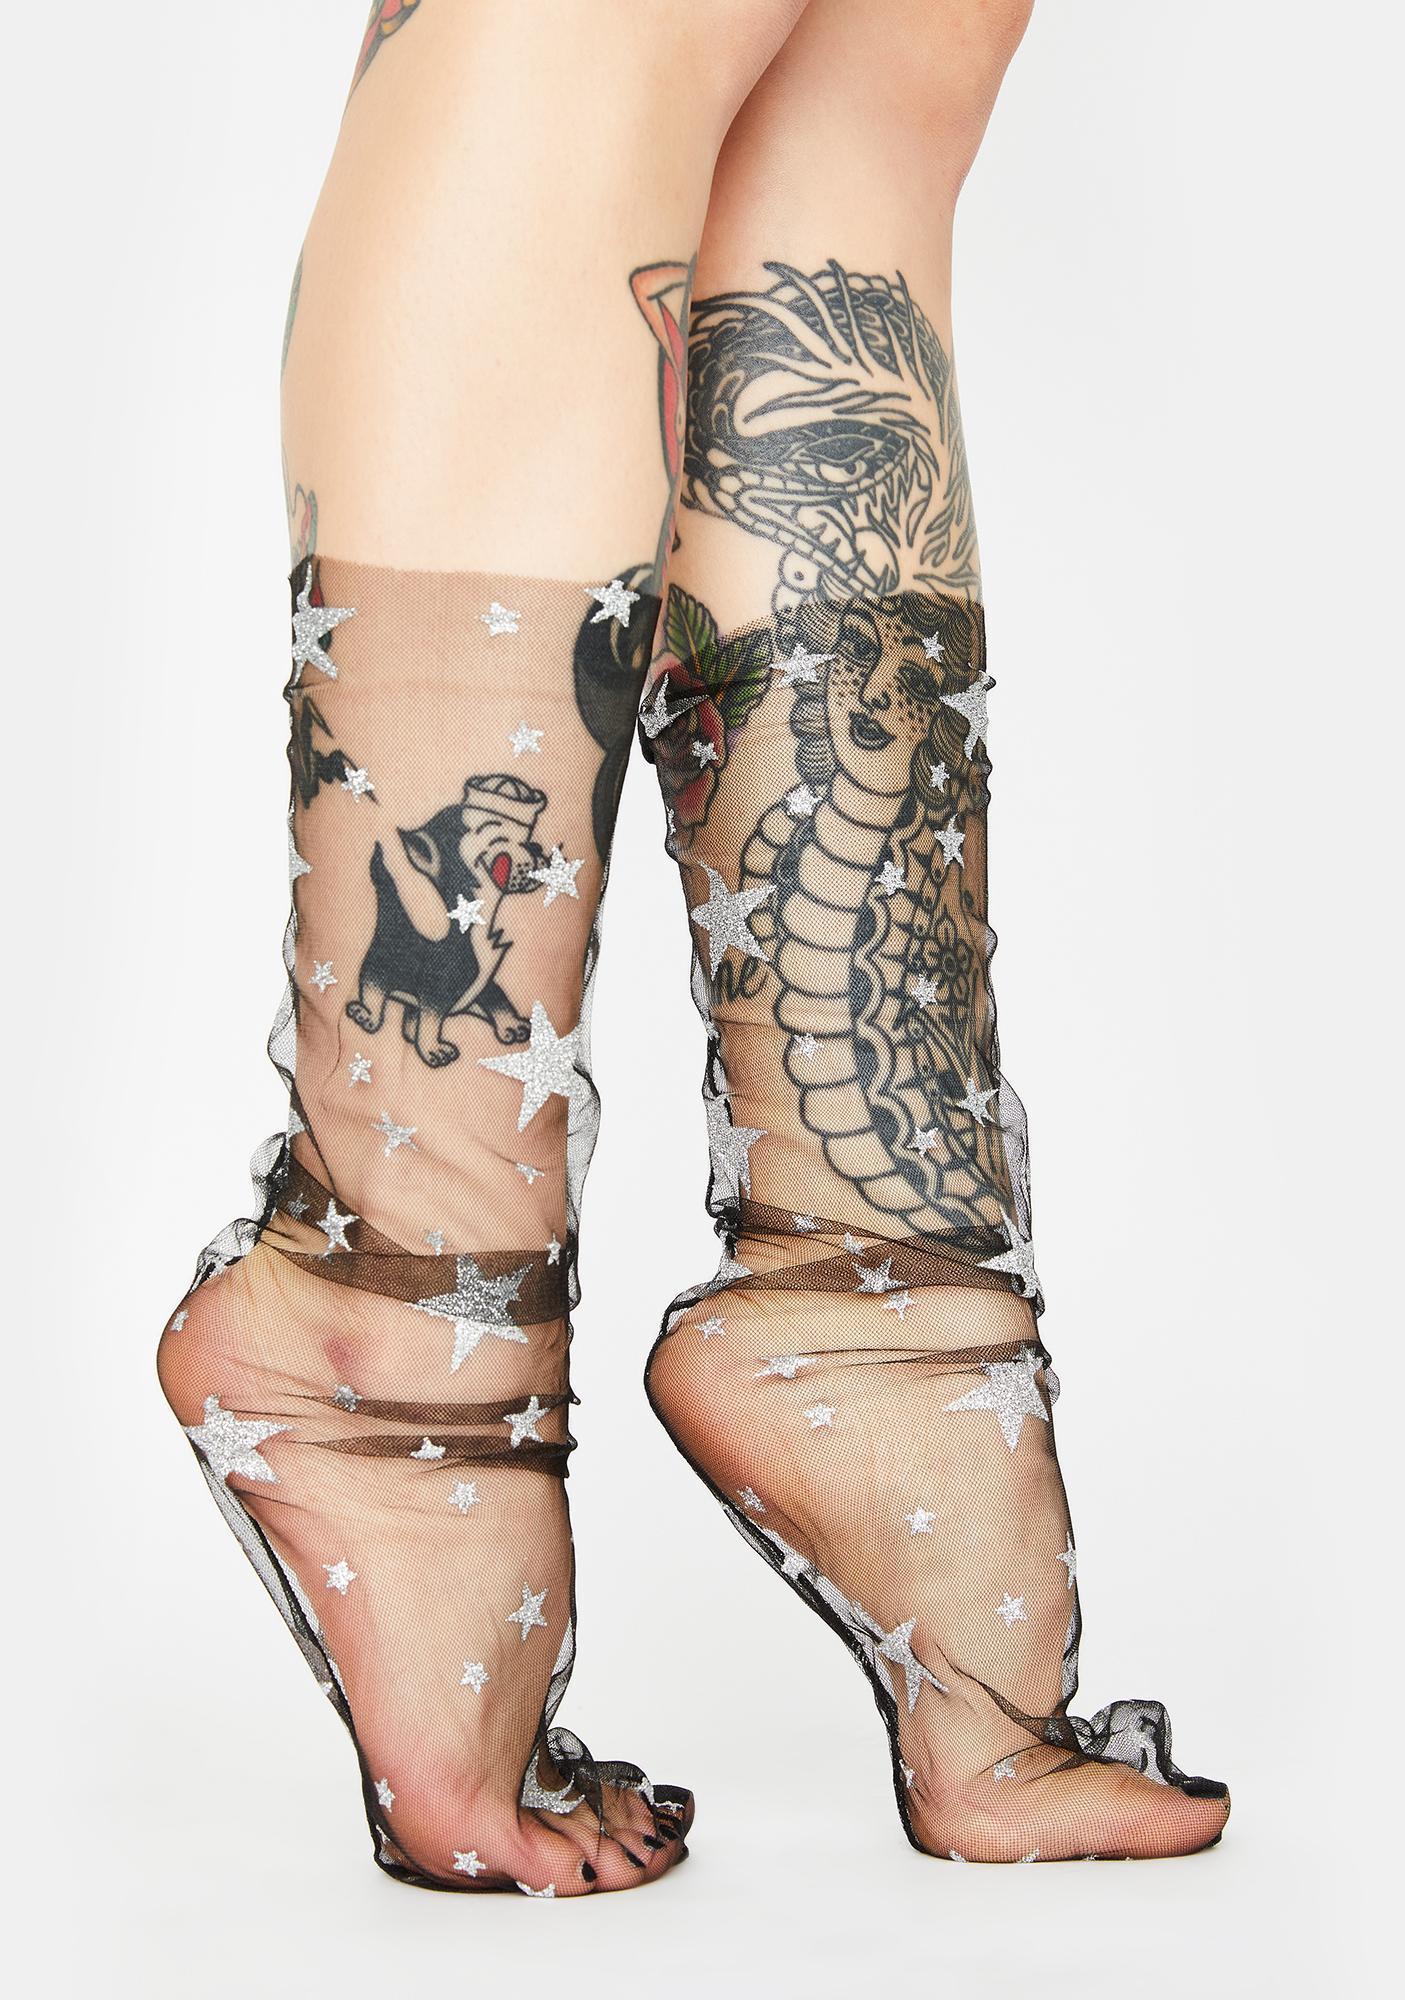 Wish Upon A Star Sheer Socks